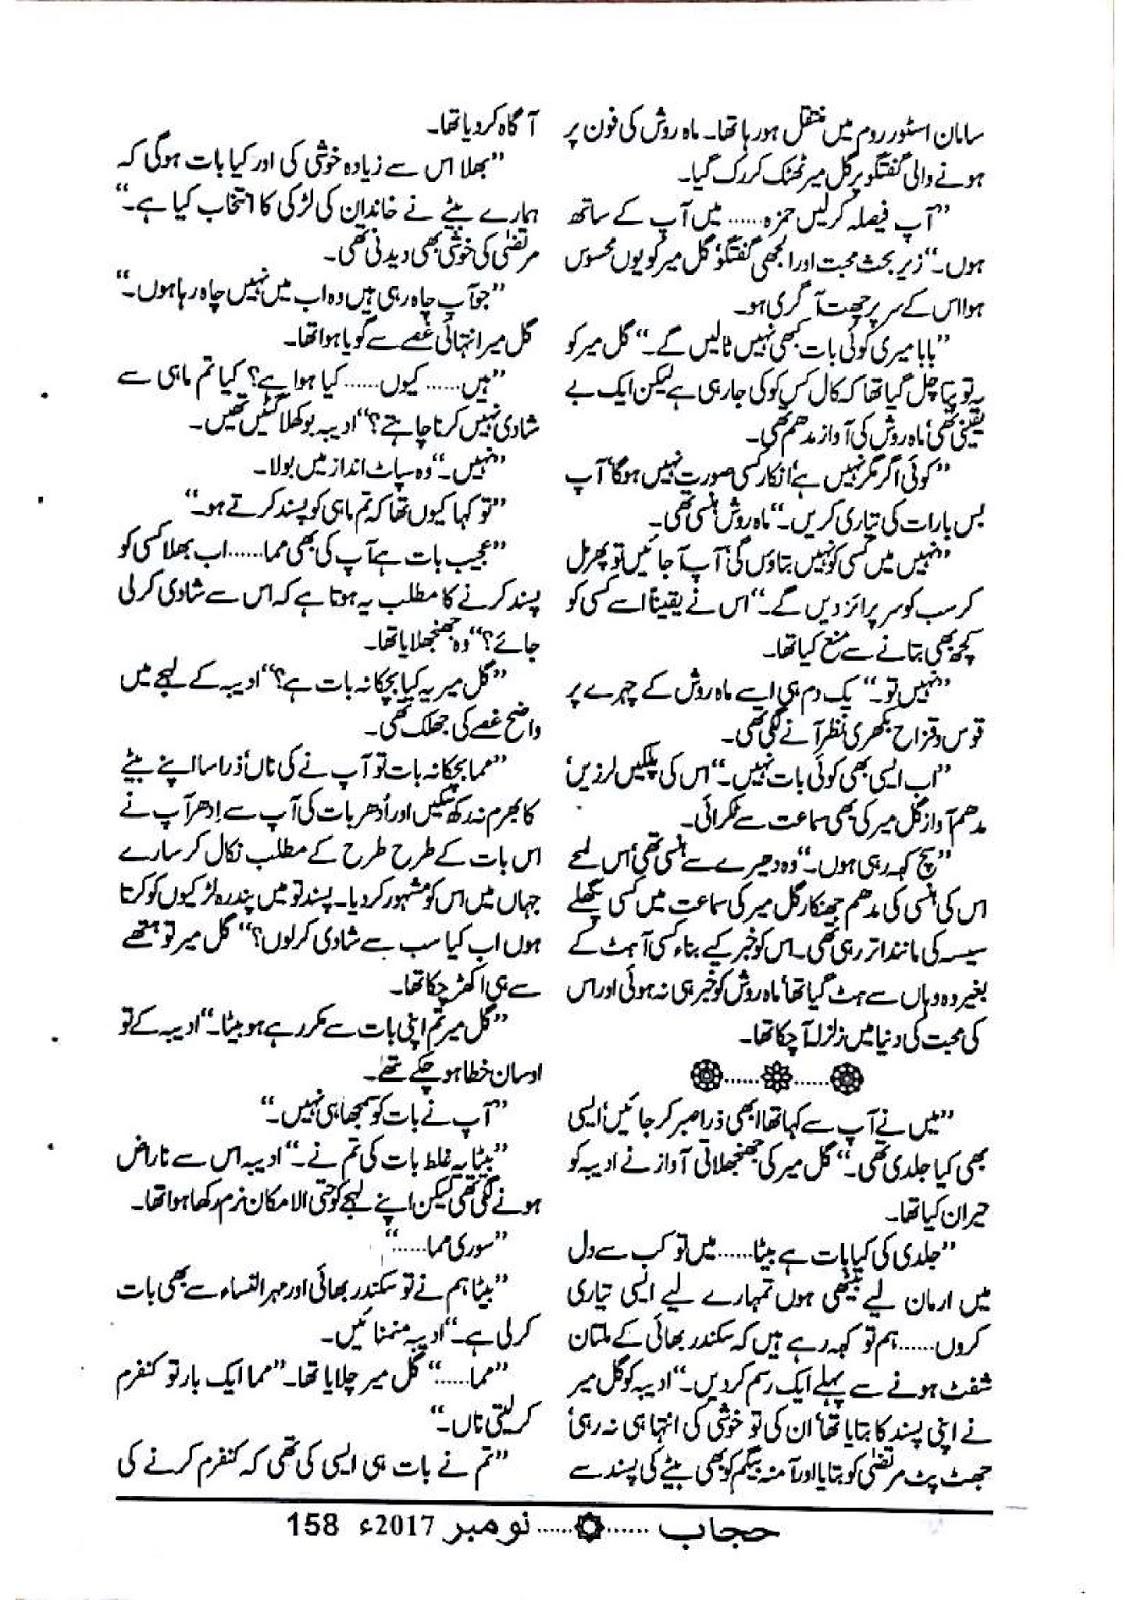 prime online novels mohabbat meri aakhri shararat thi by saima Florence Oboshie Sai-Coffie click on read more to continue reading